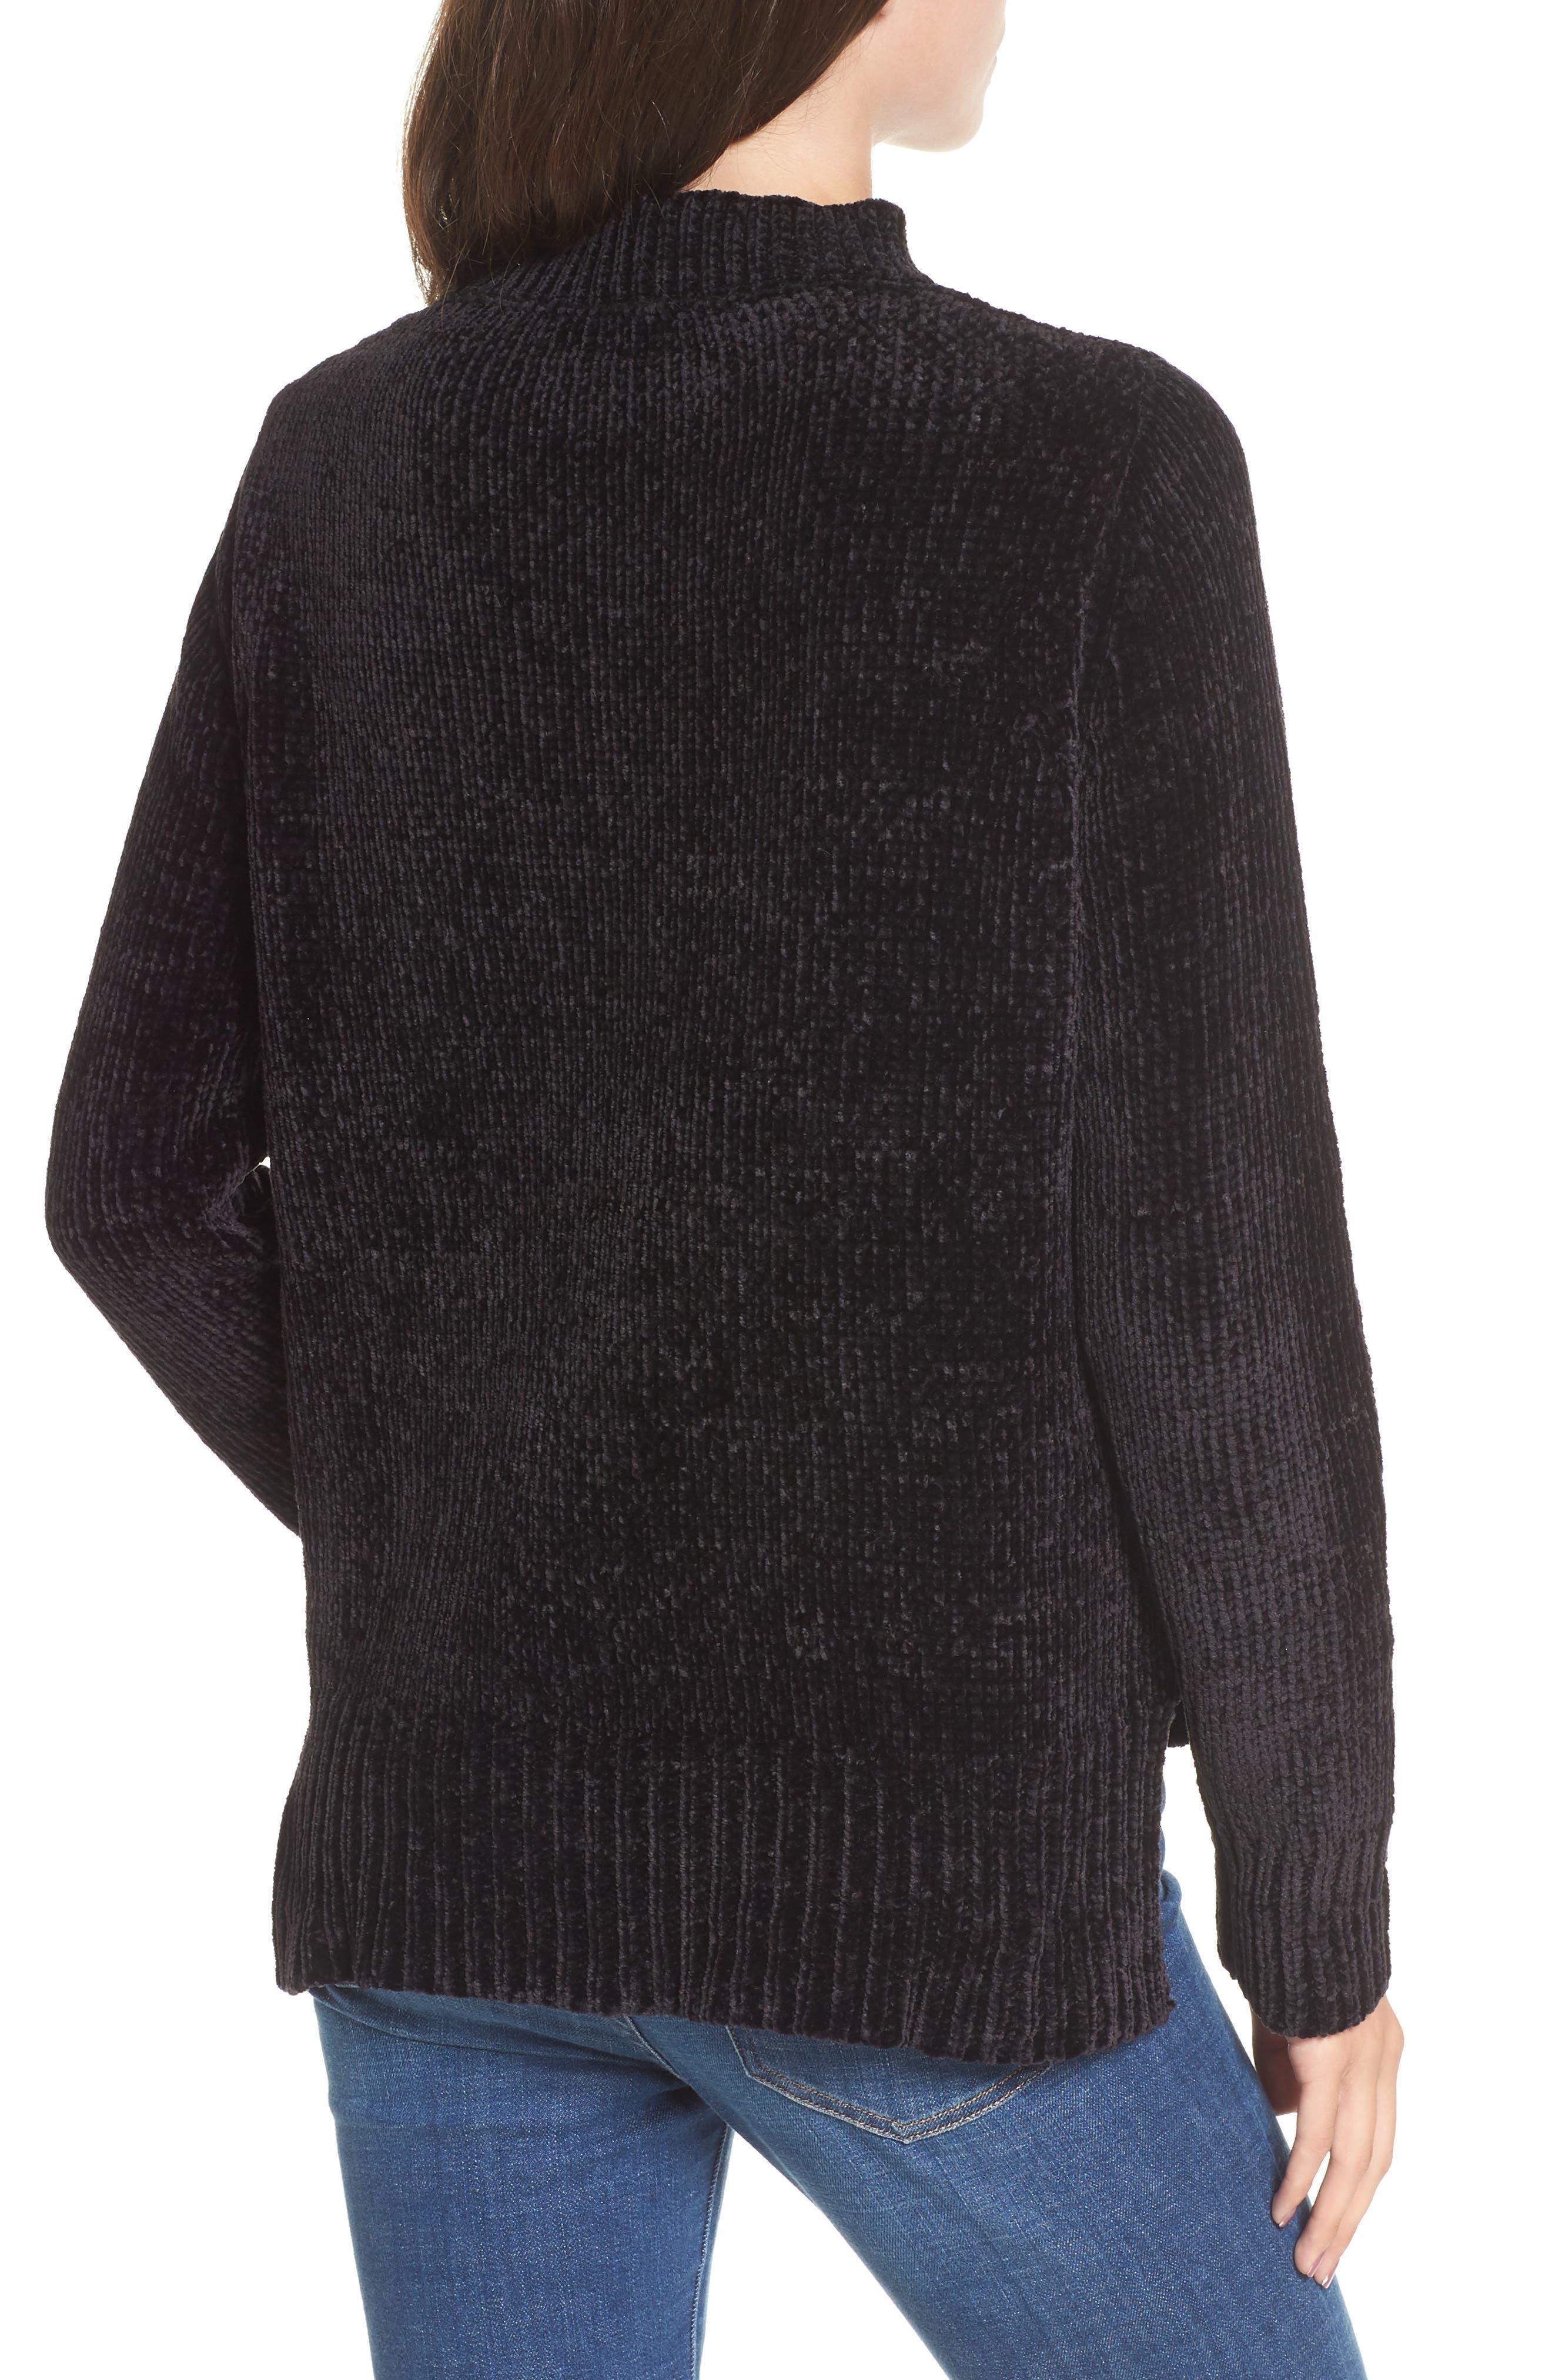 Chenille Choker Neck Sweater,                             Alternate thumbnail 2, color,                             Black